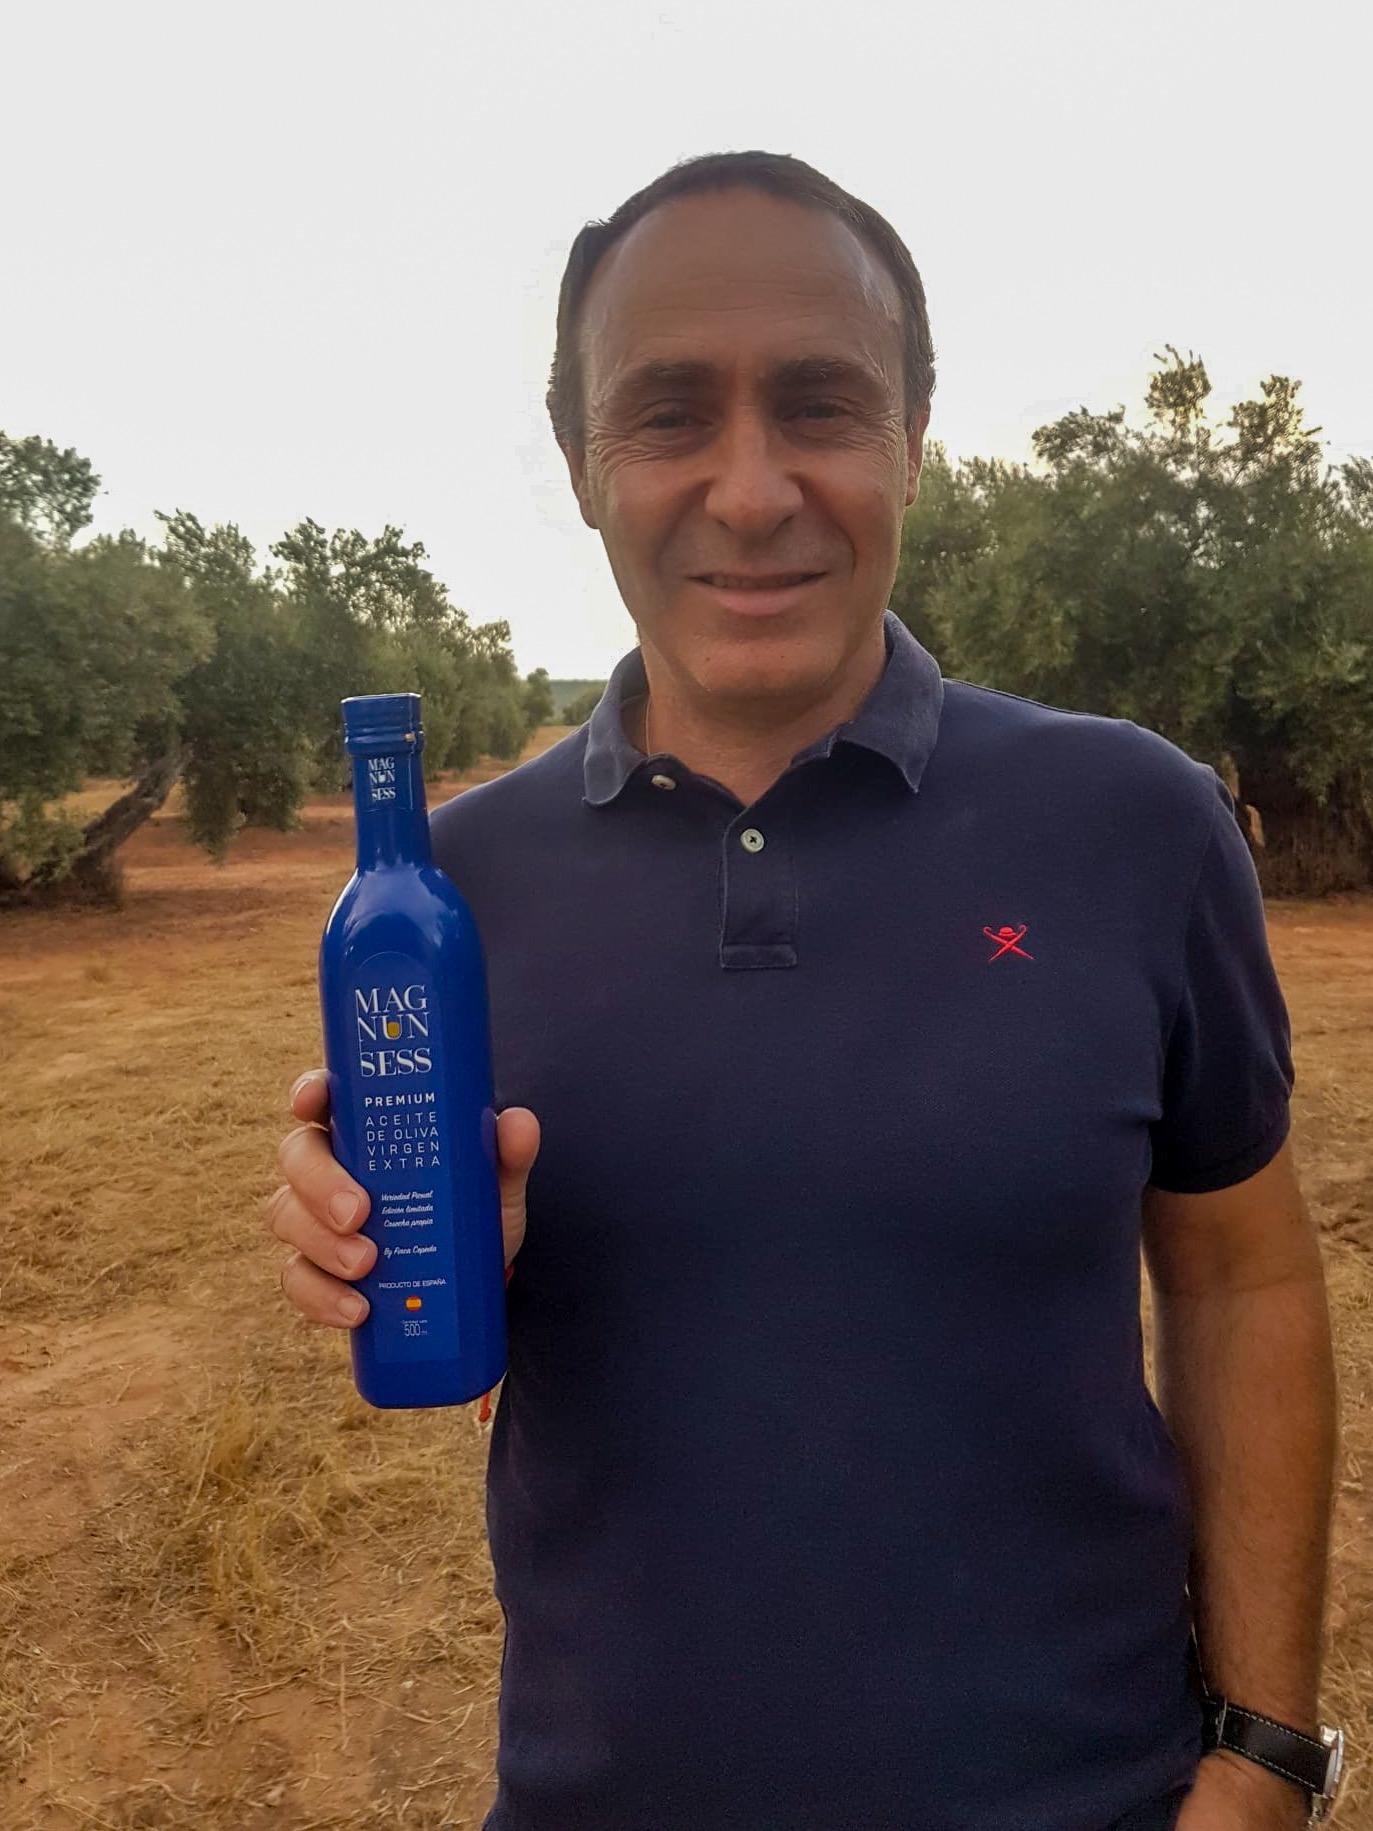 Manuel Nieto, CEO Magnun Sess